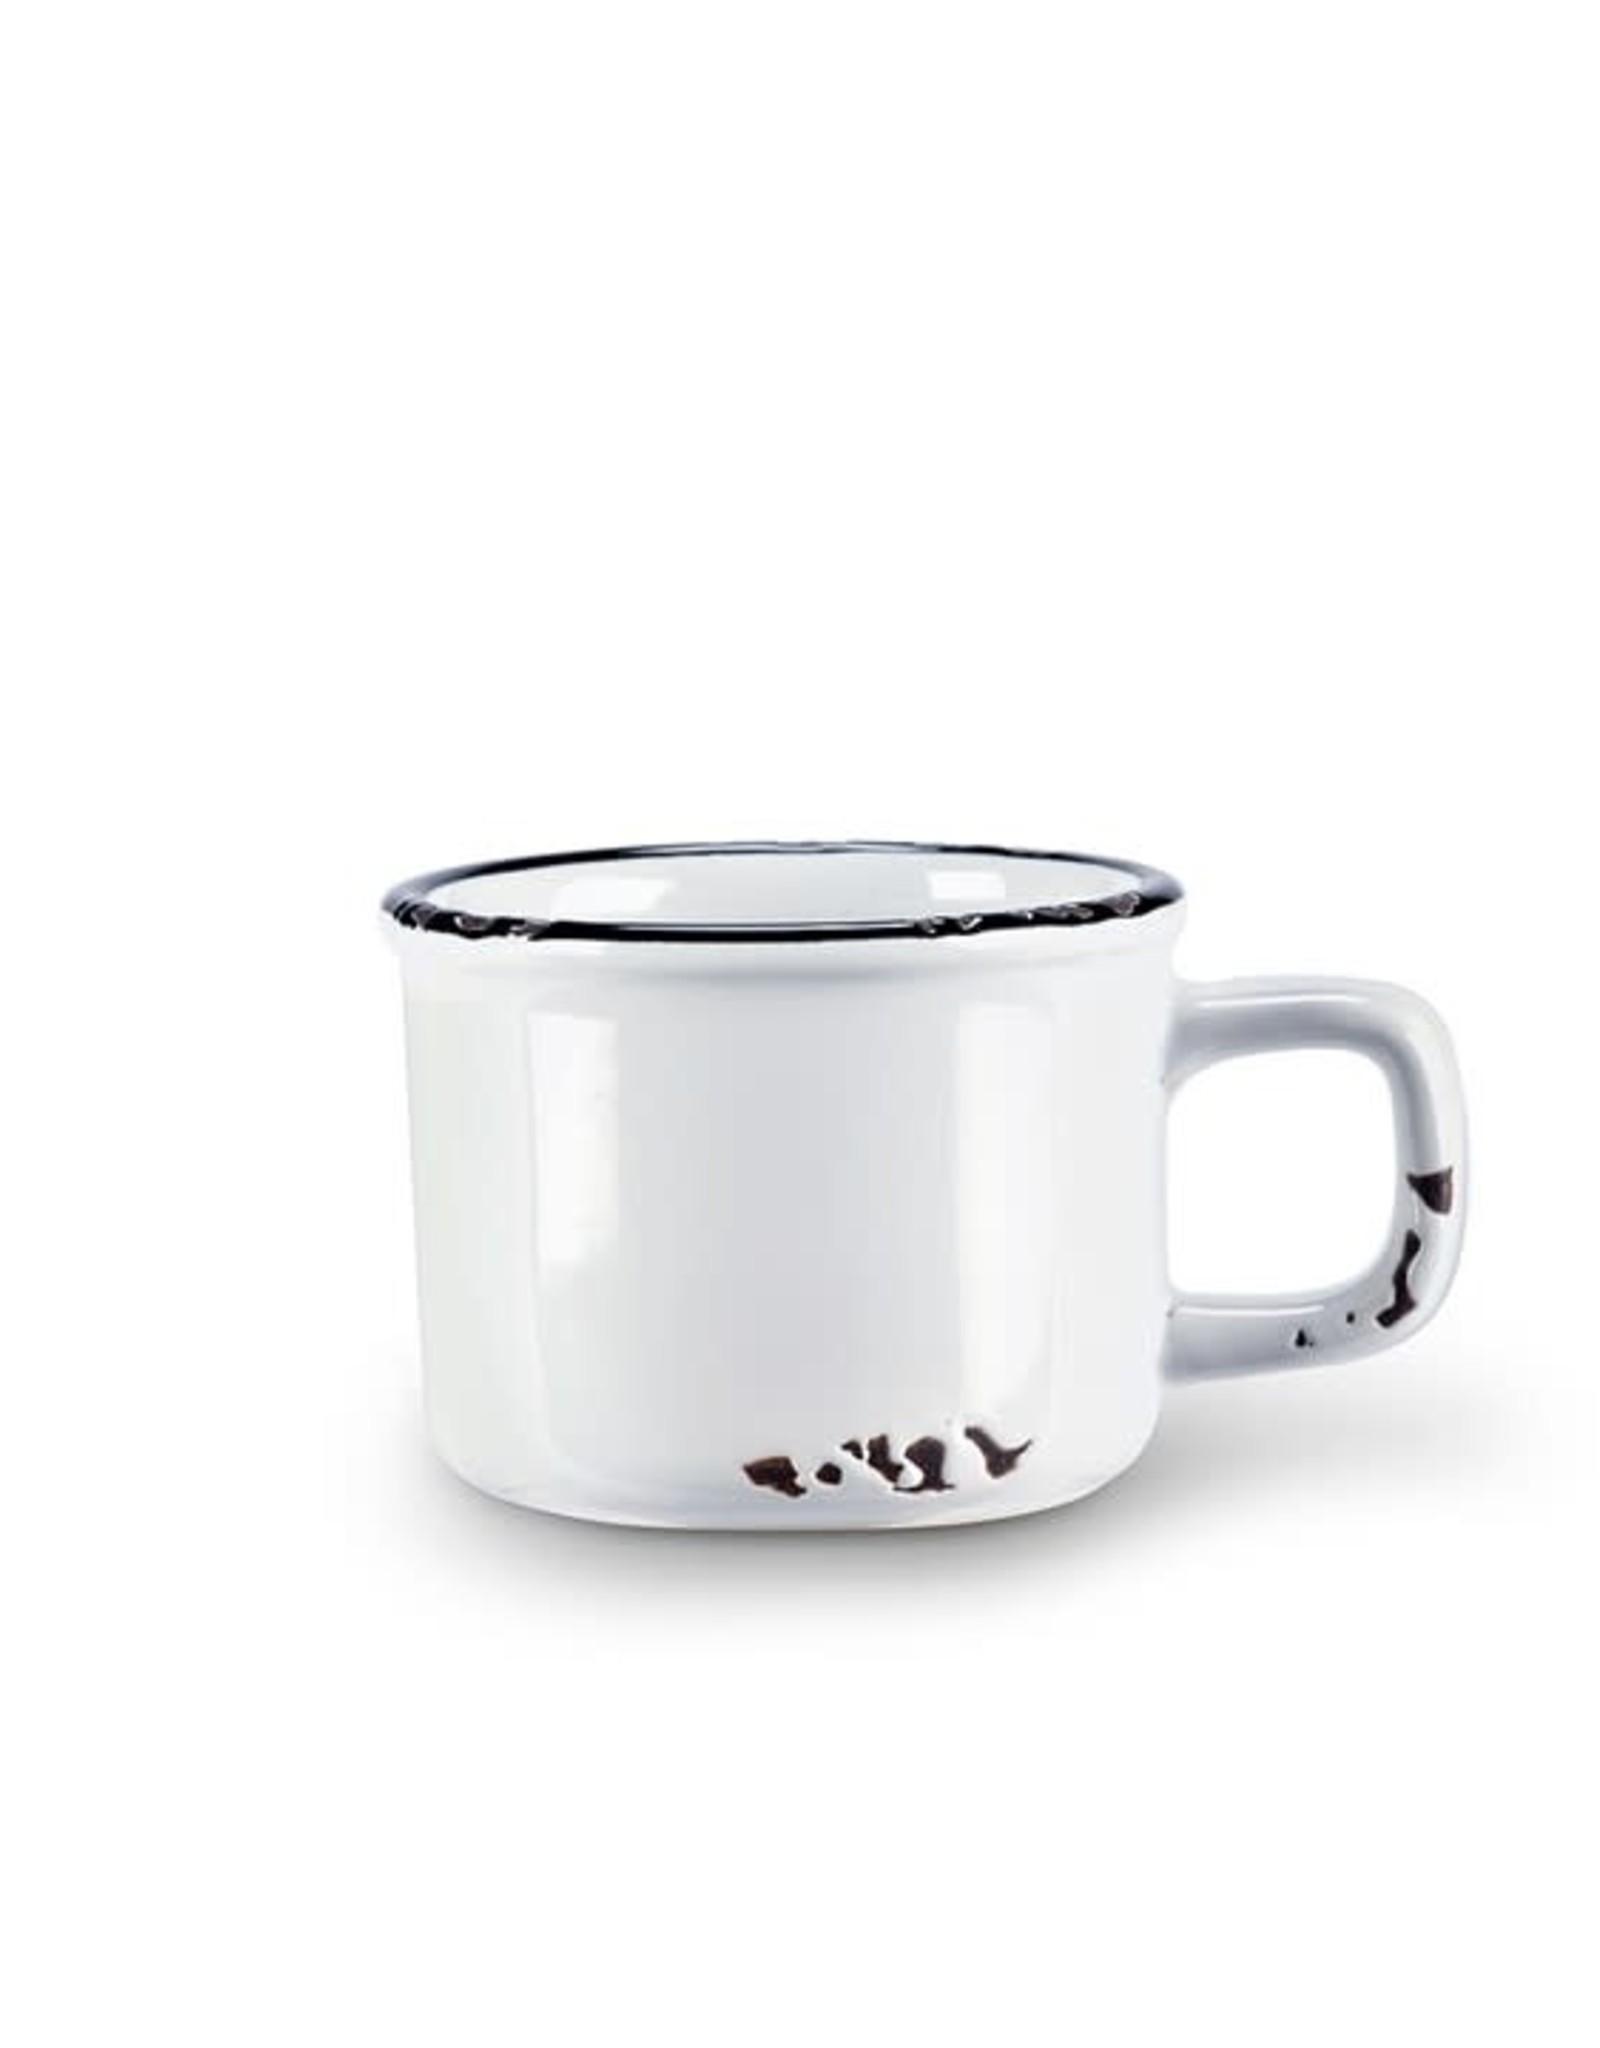 Tasse espresso blanche